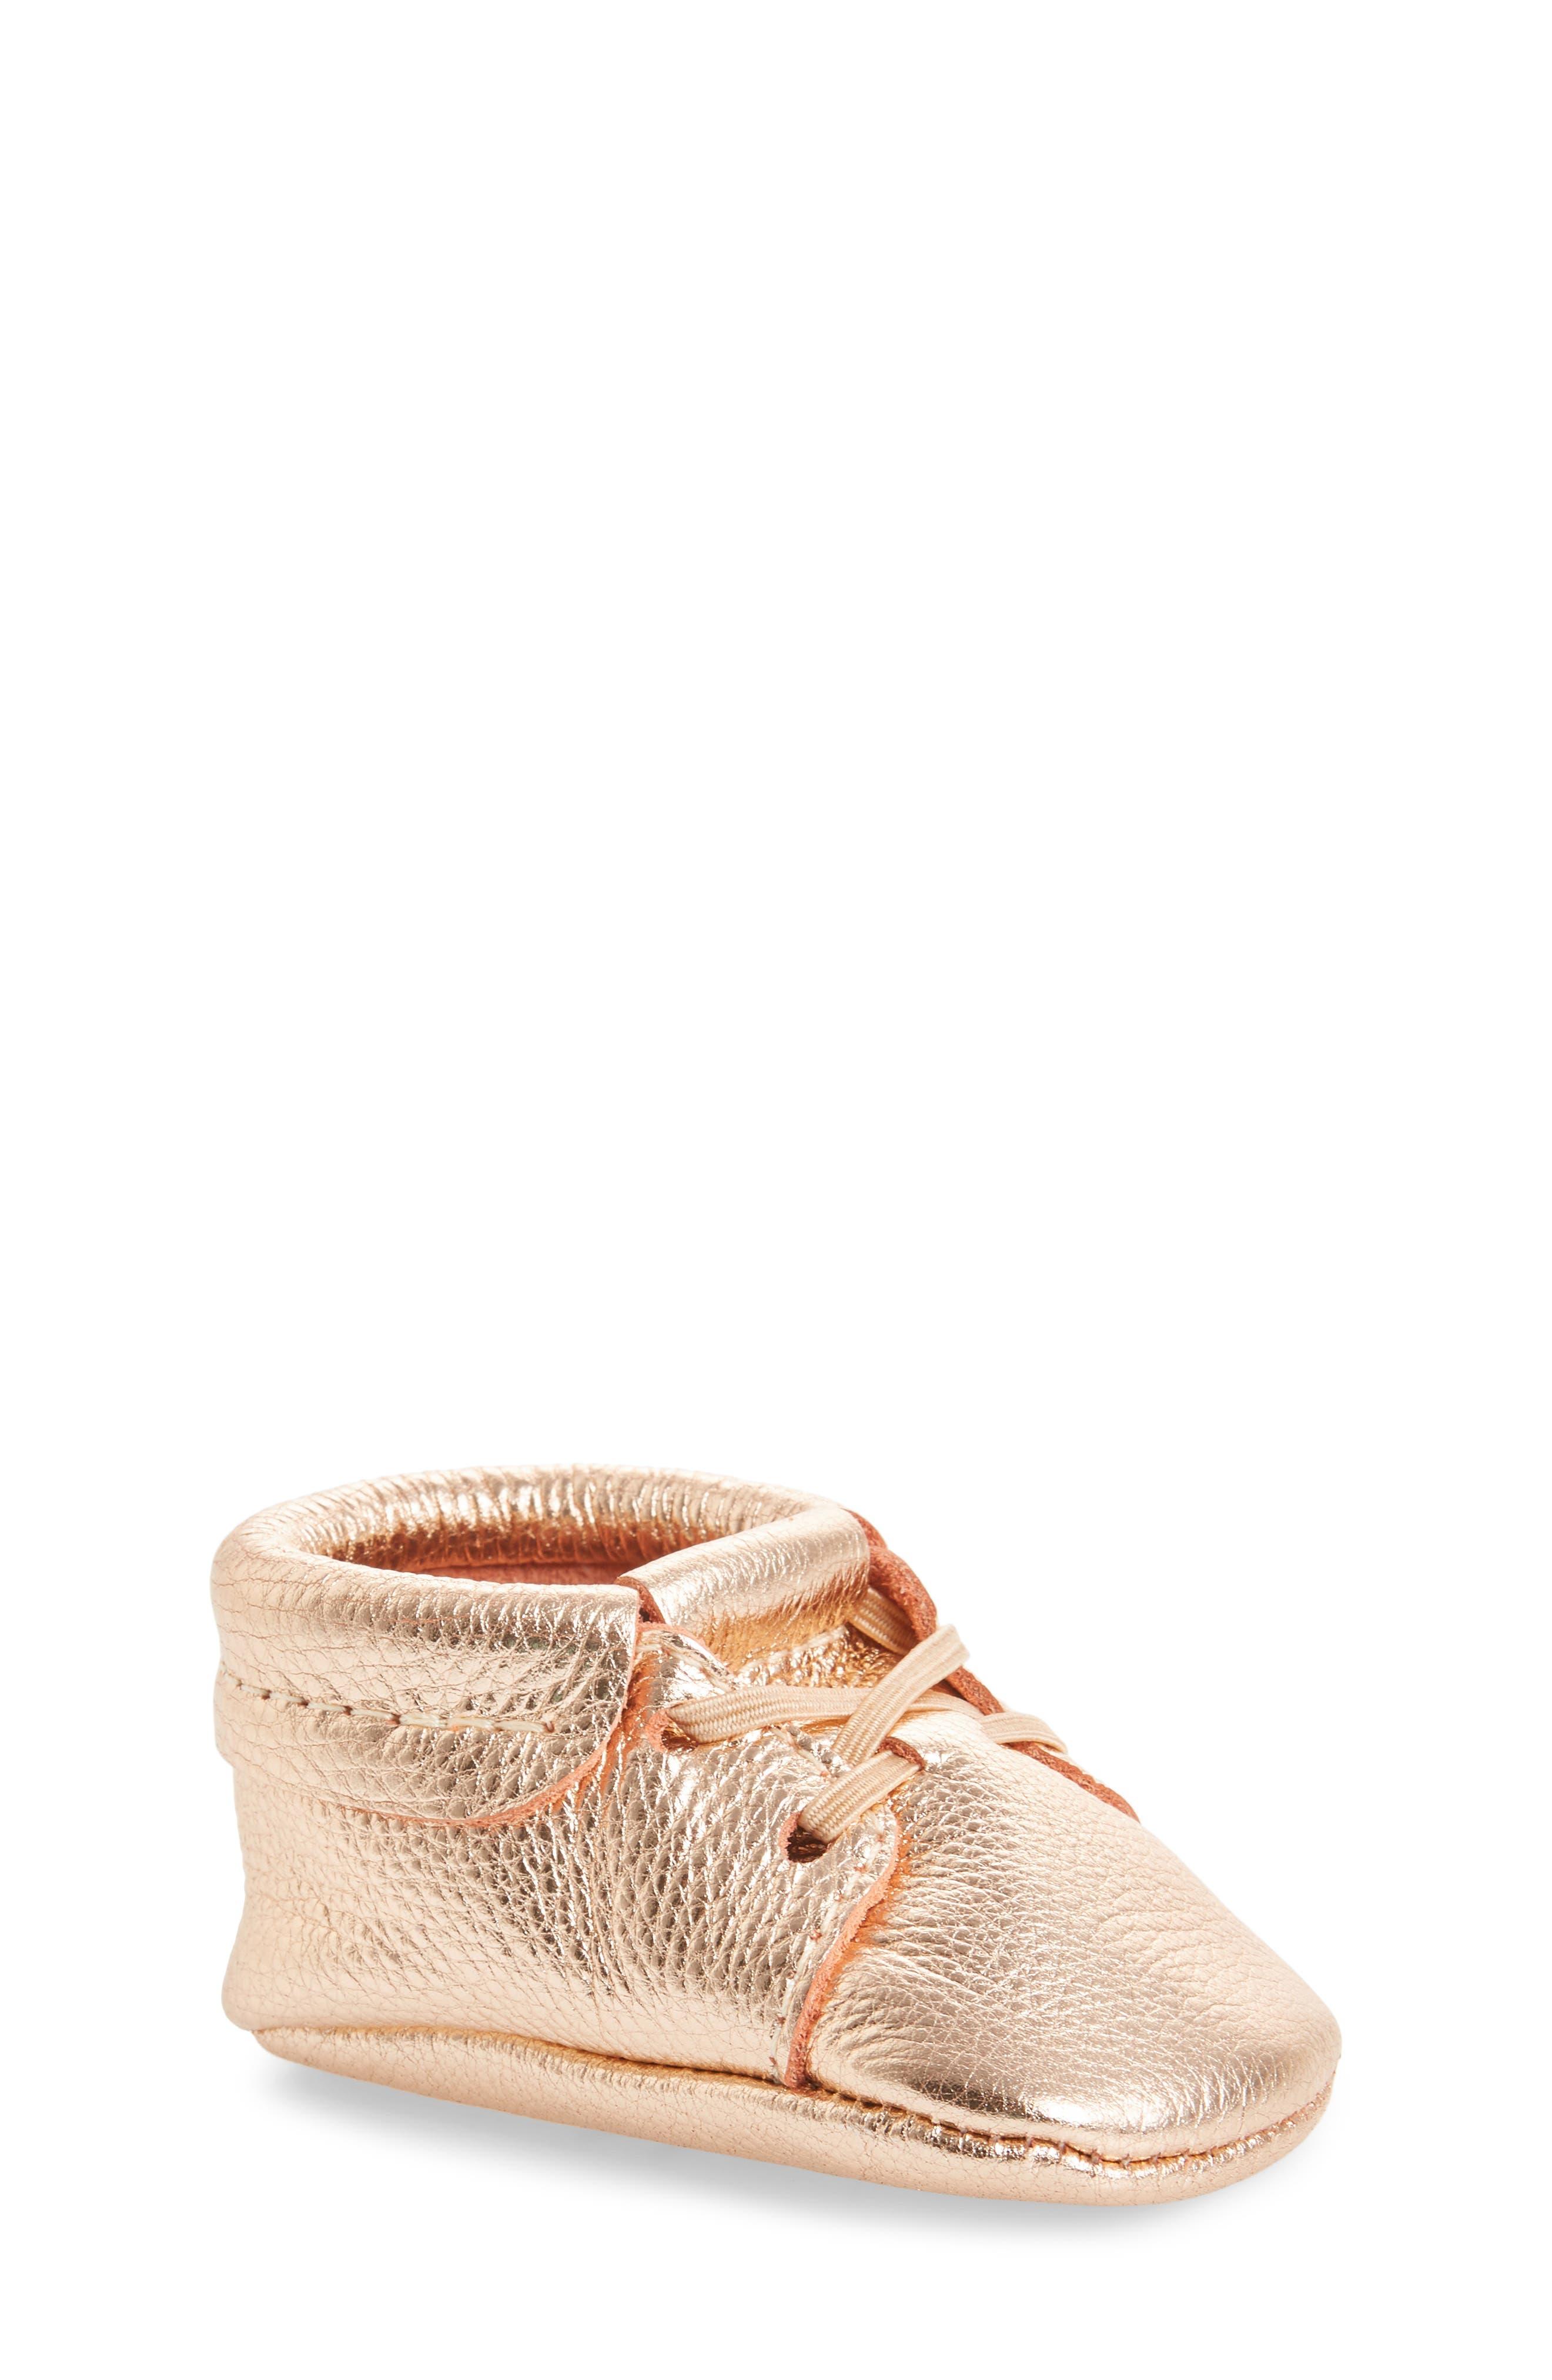 Oxford Crib Shoe,                             Main thumbnail 1, color,                             ROSE GOLD LEATHER